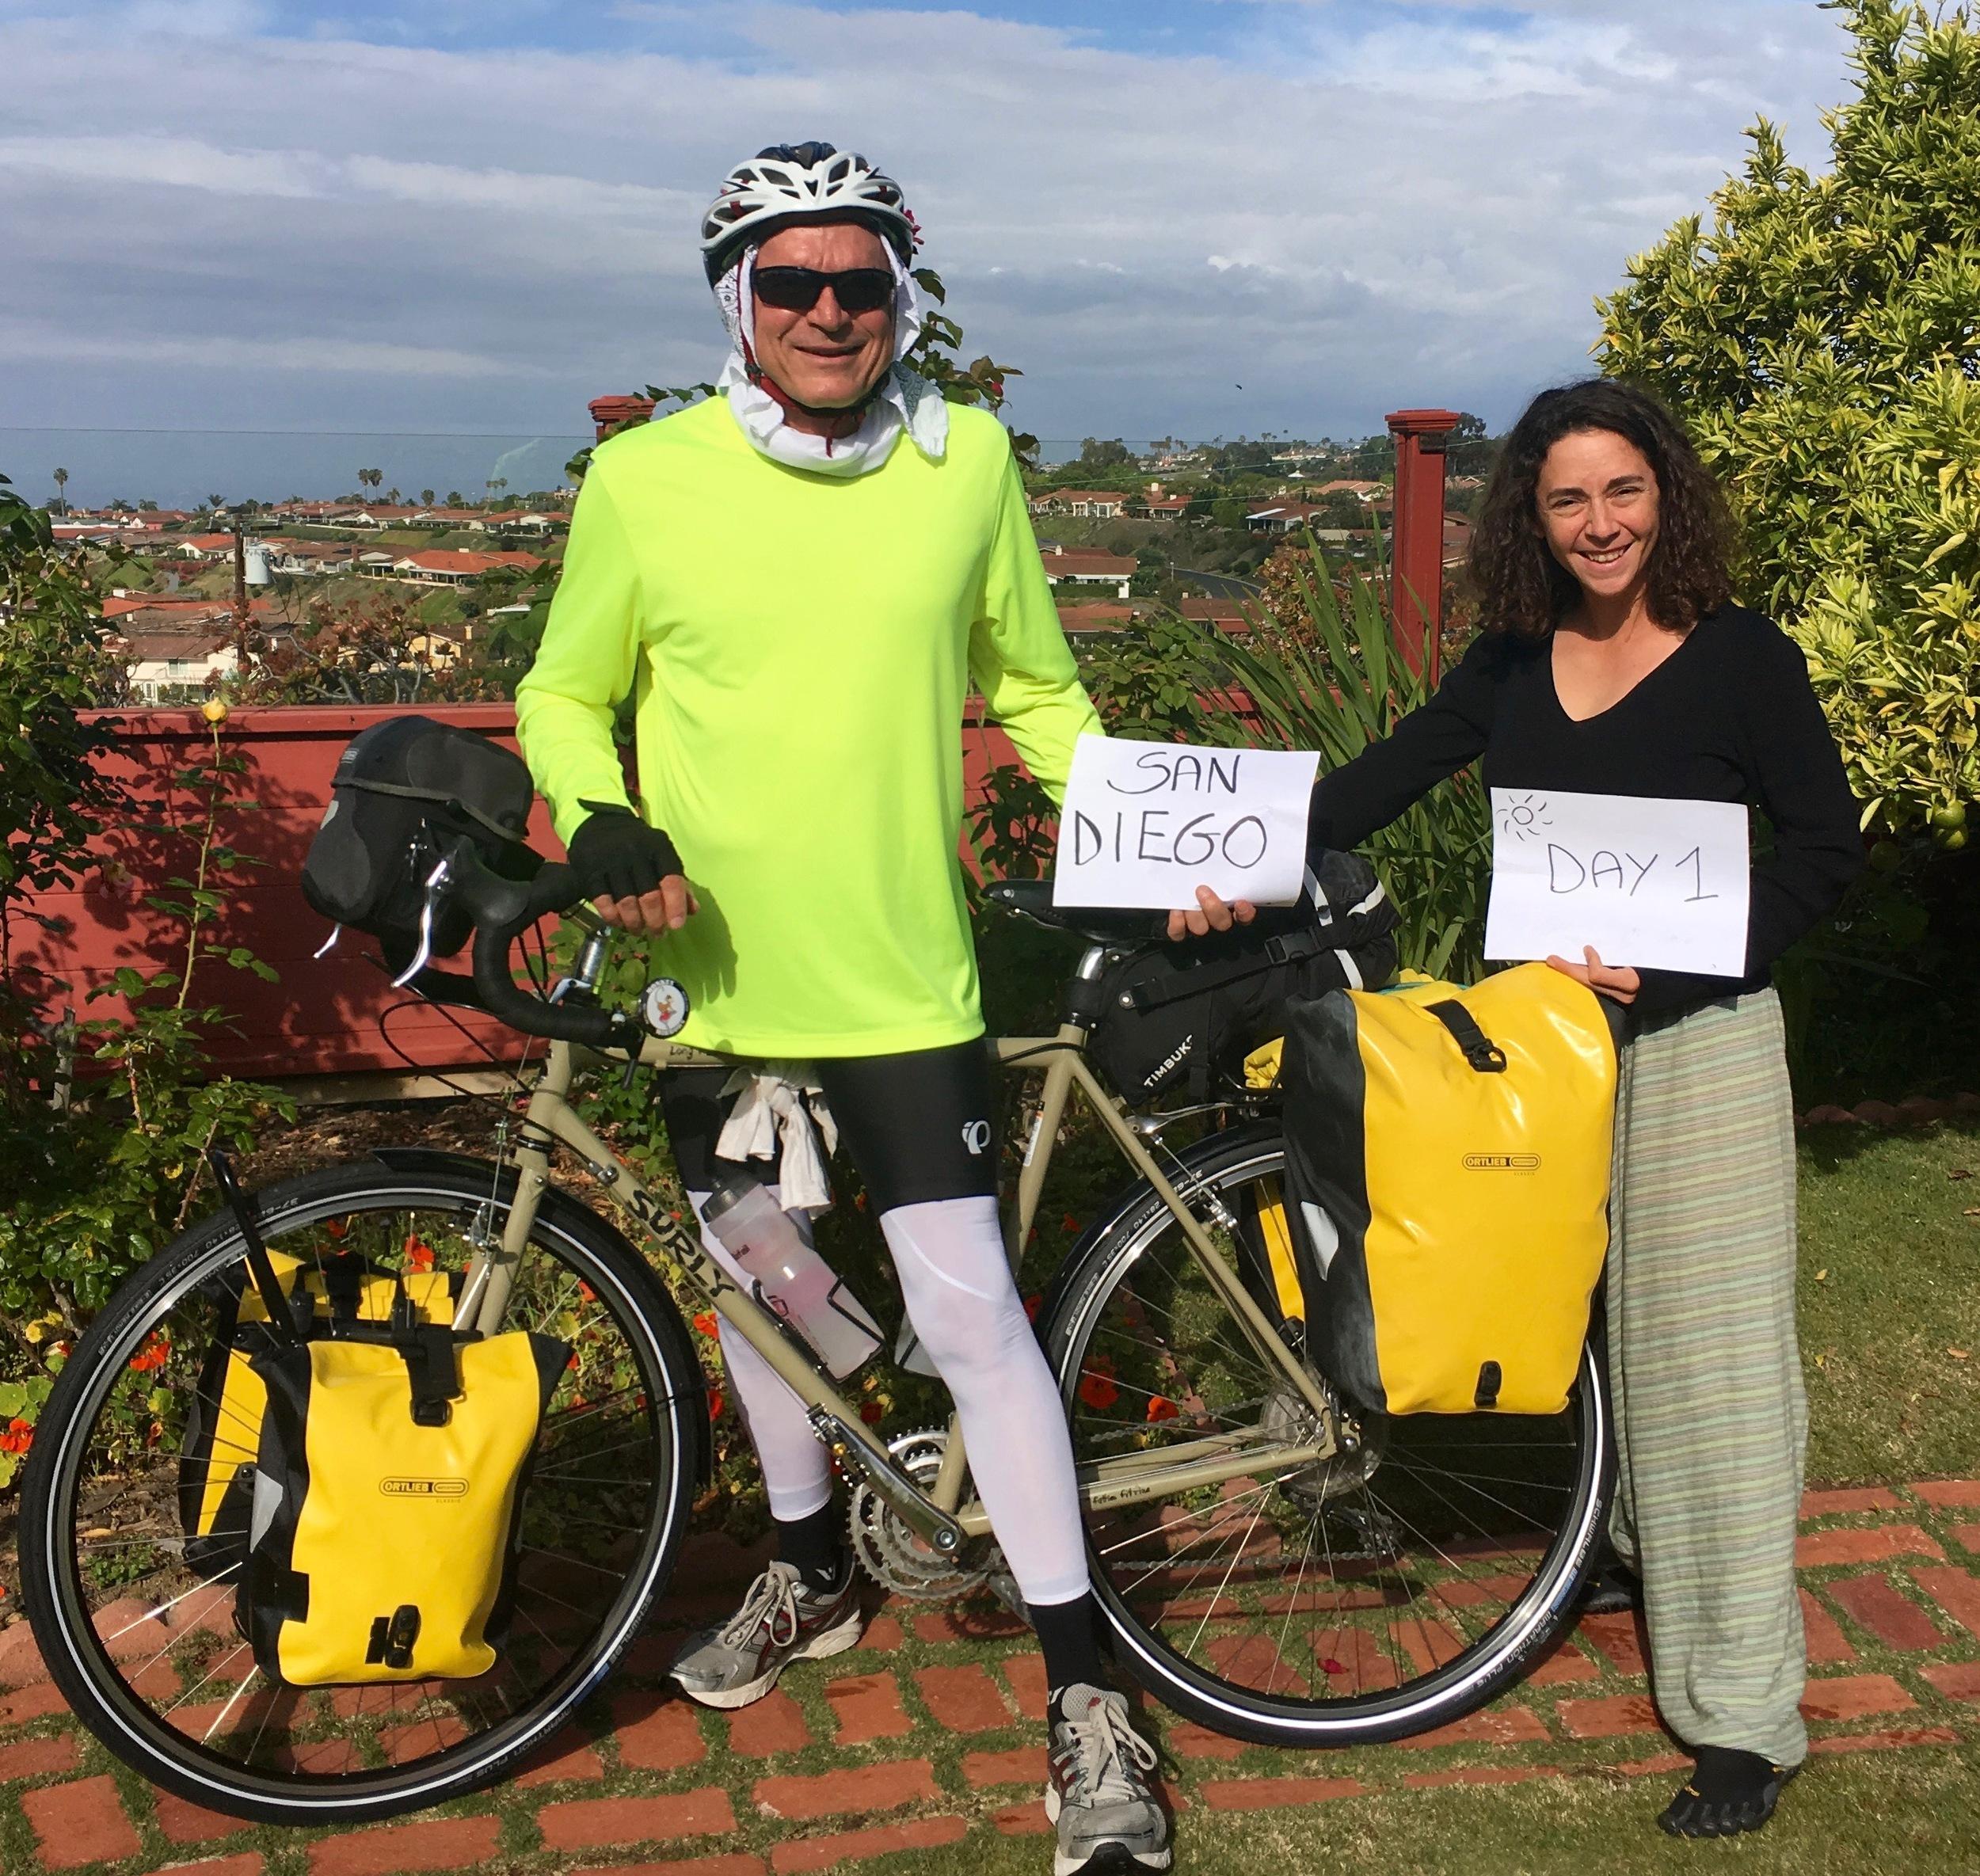 Me with Laura Galavis,a Solar Installation Supervisor (SIS) at GRID, San Diego.